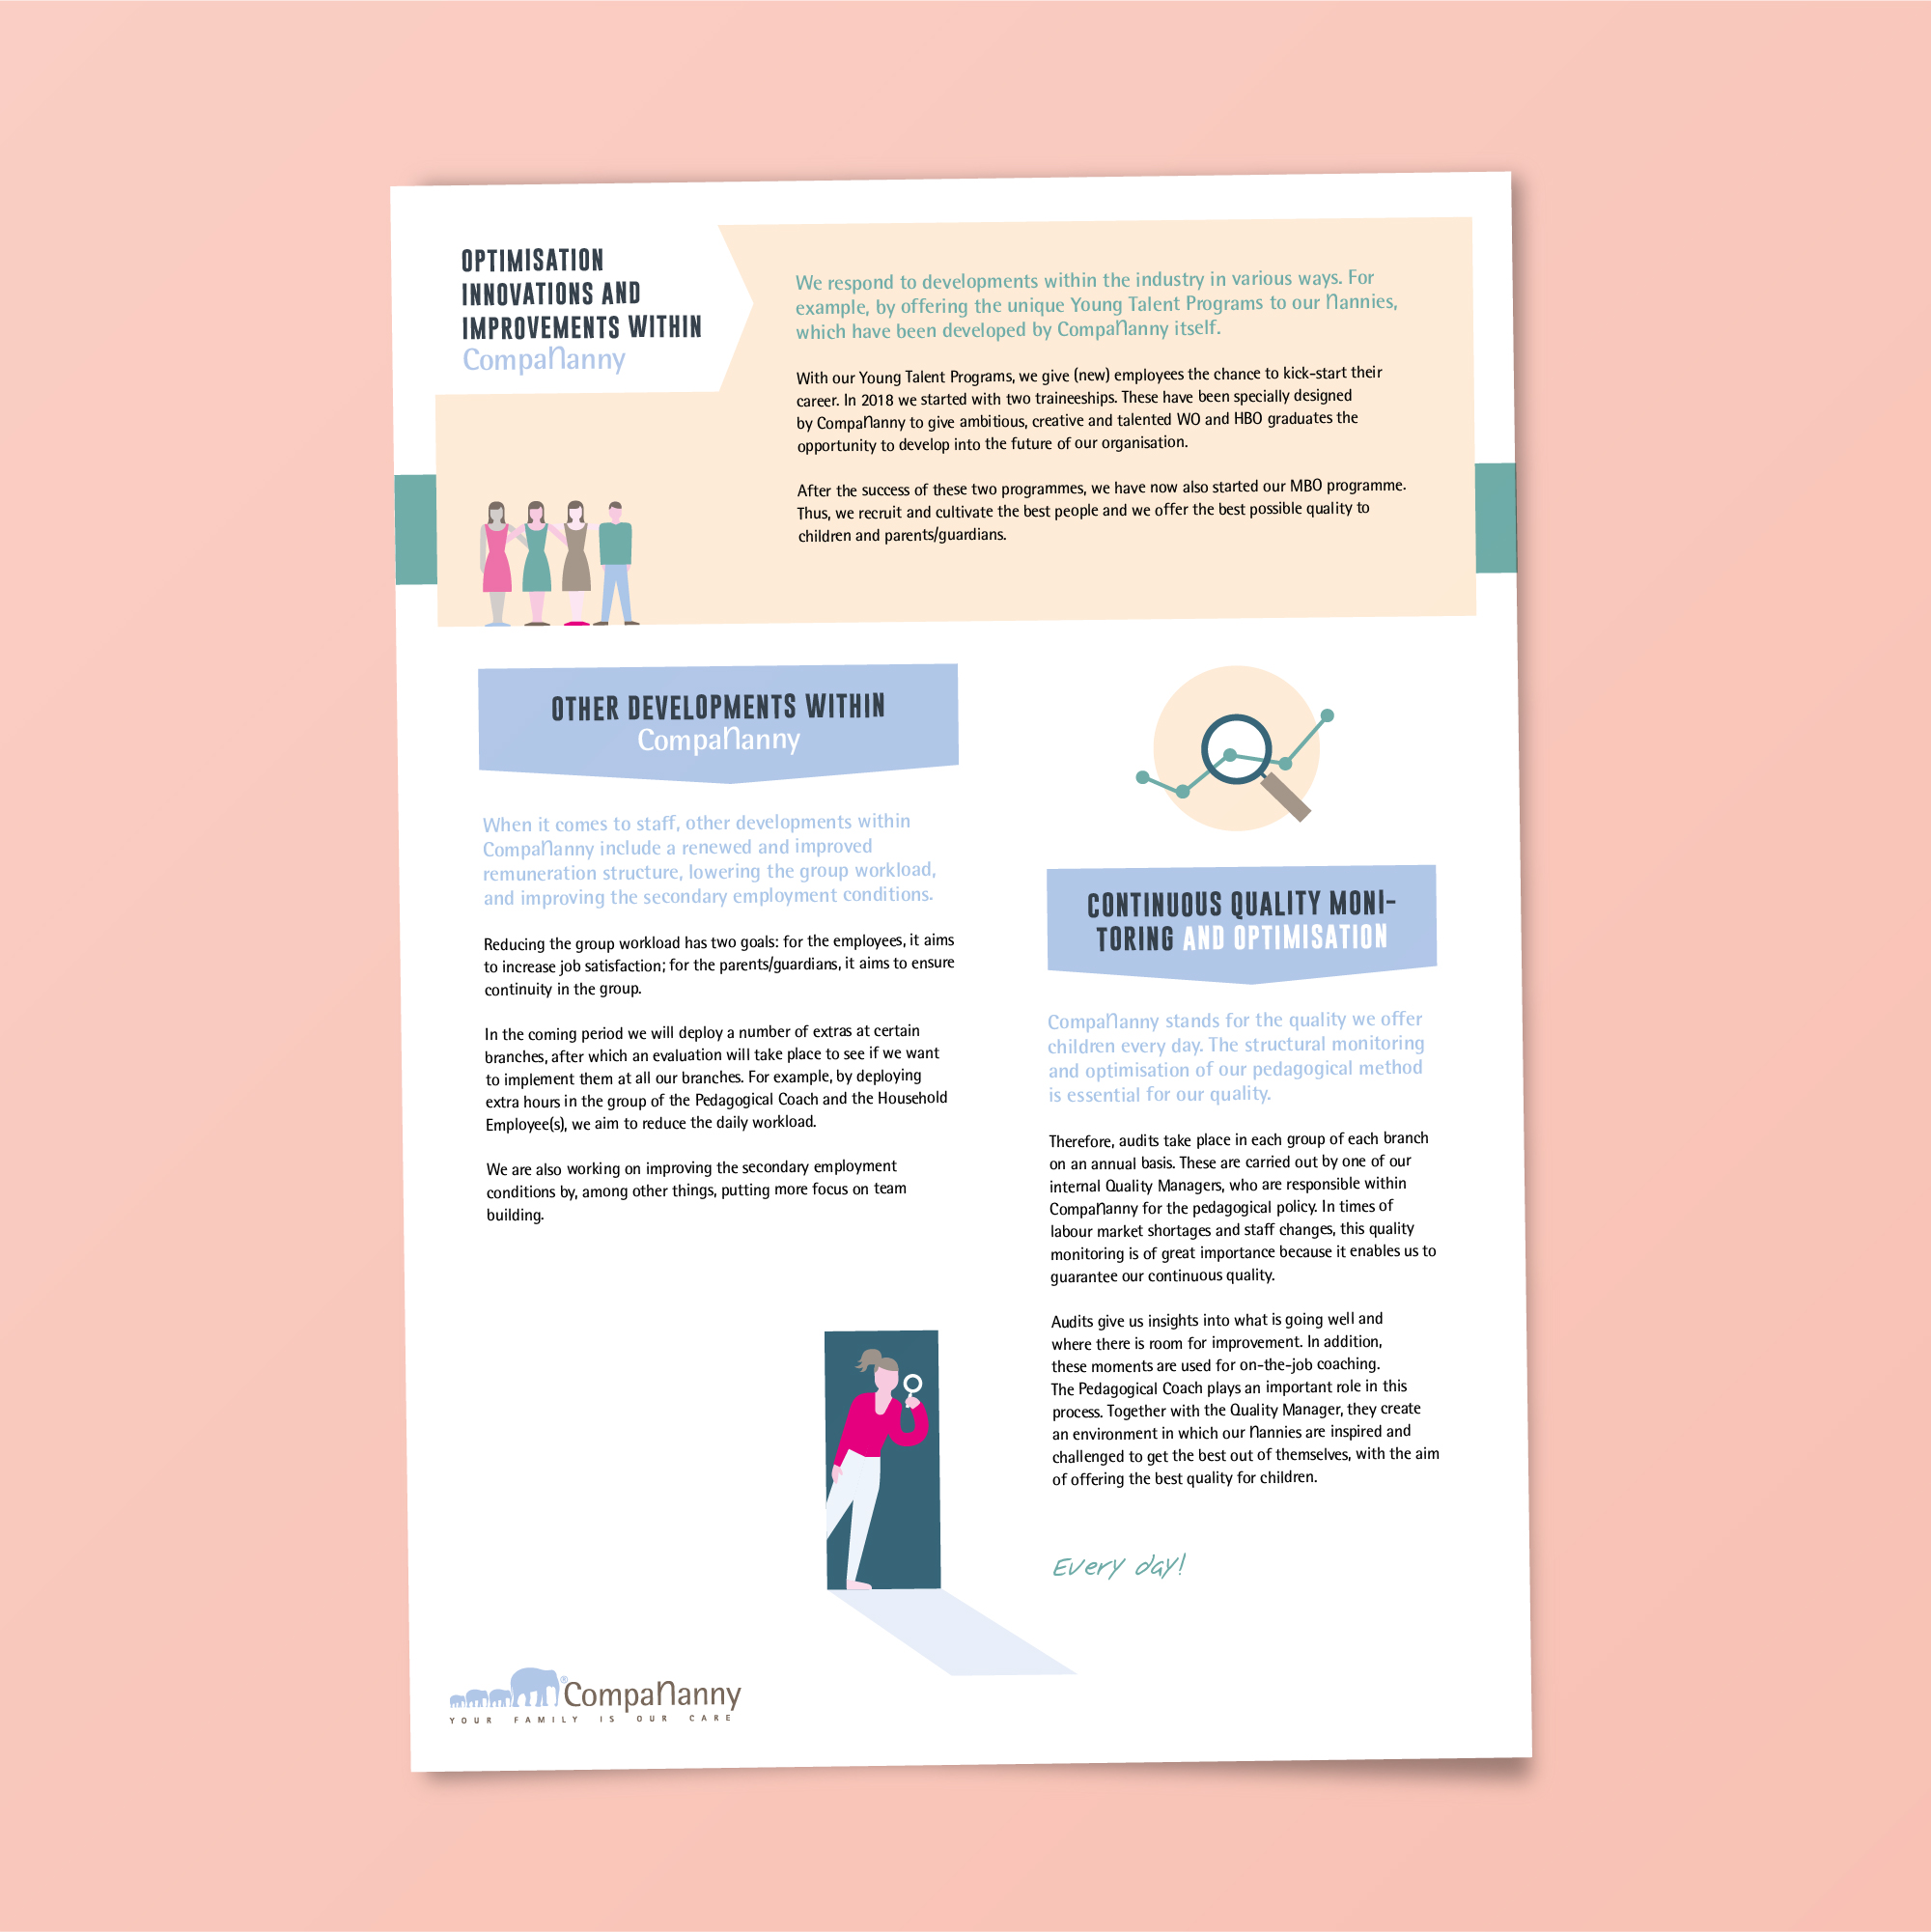 portfolio-dimgray-compananny-infographic-nannies-3